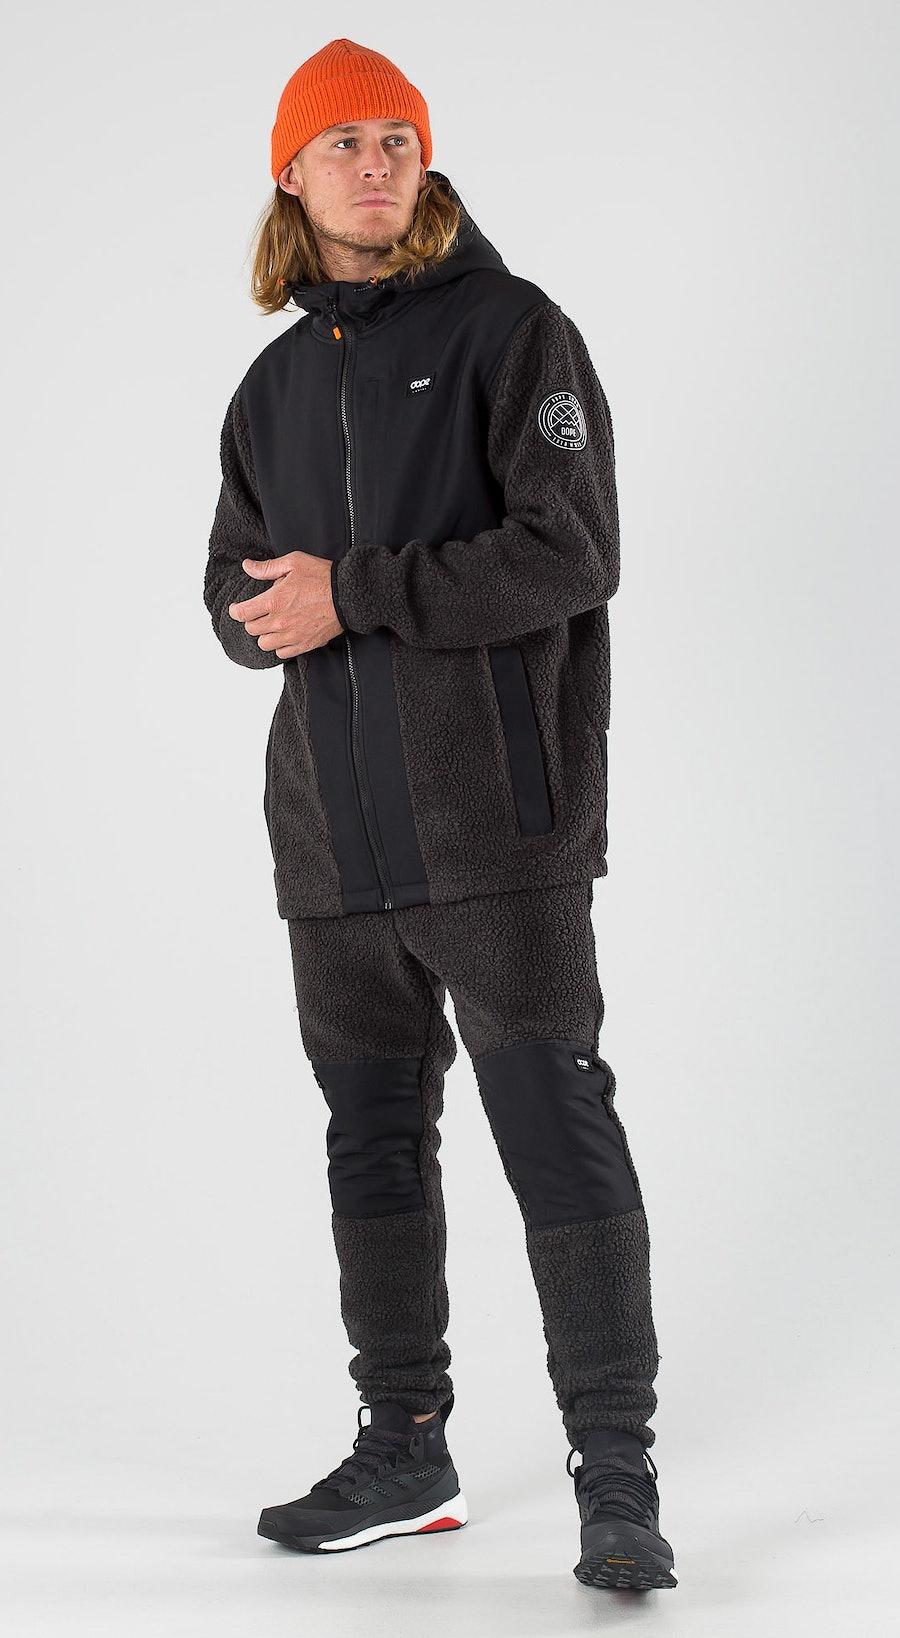 Dope Ollie Black/Phantom Outfit Multi